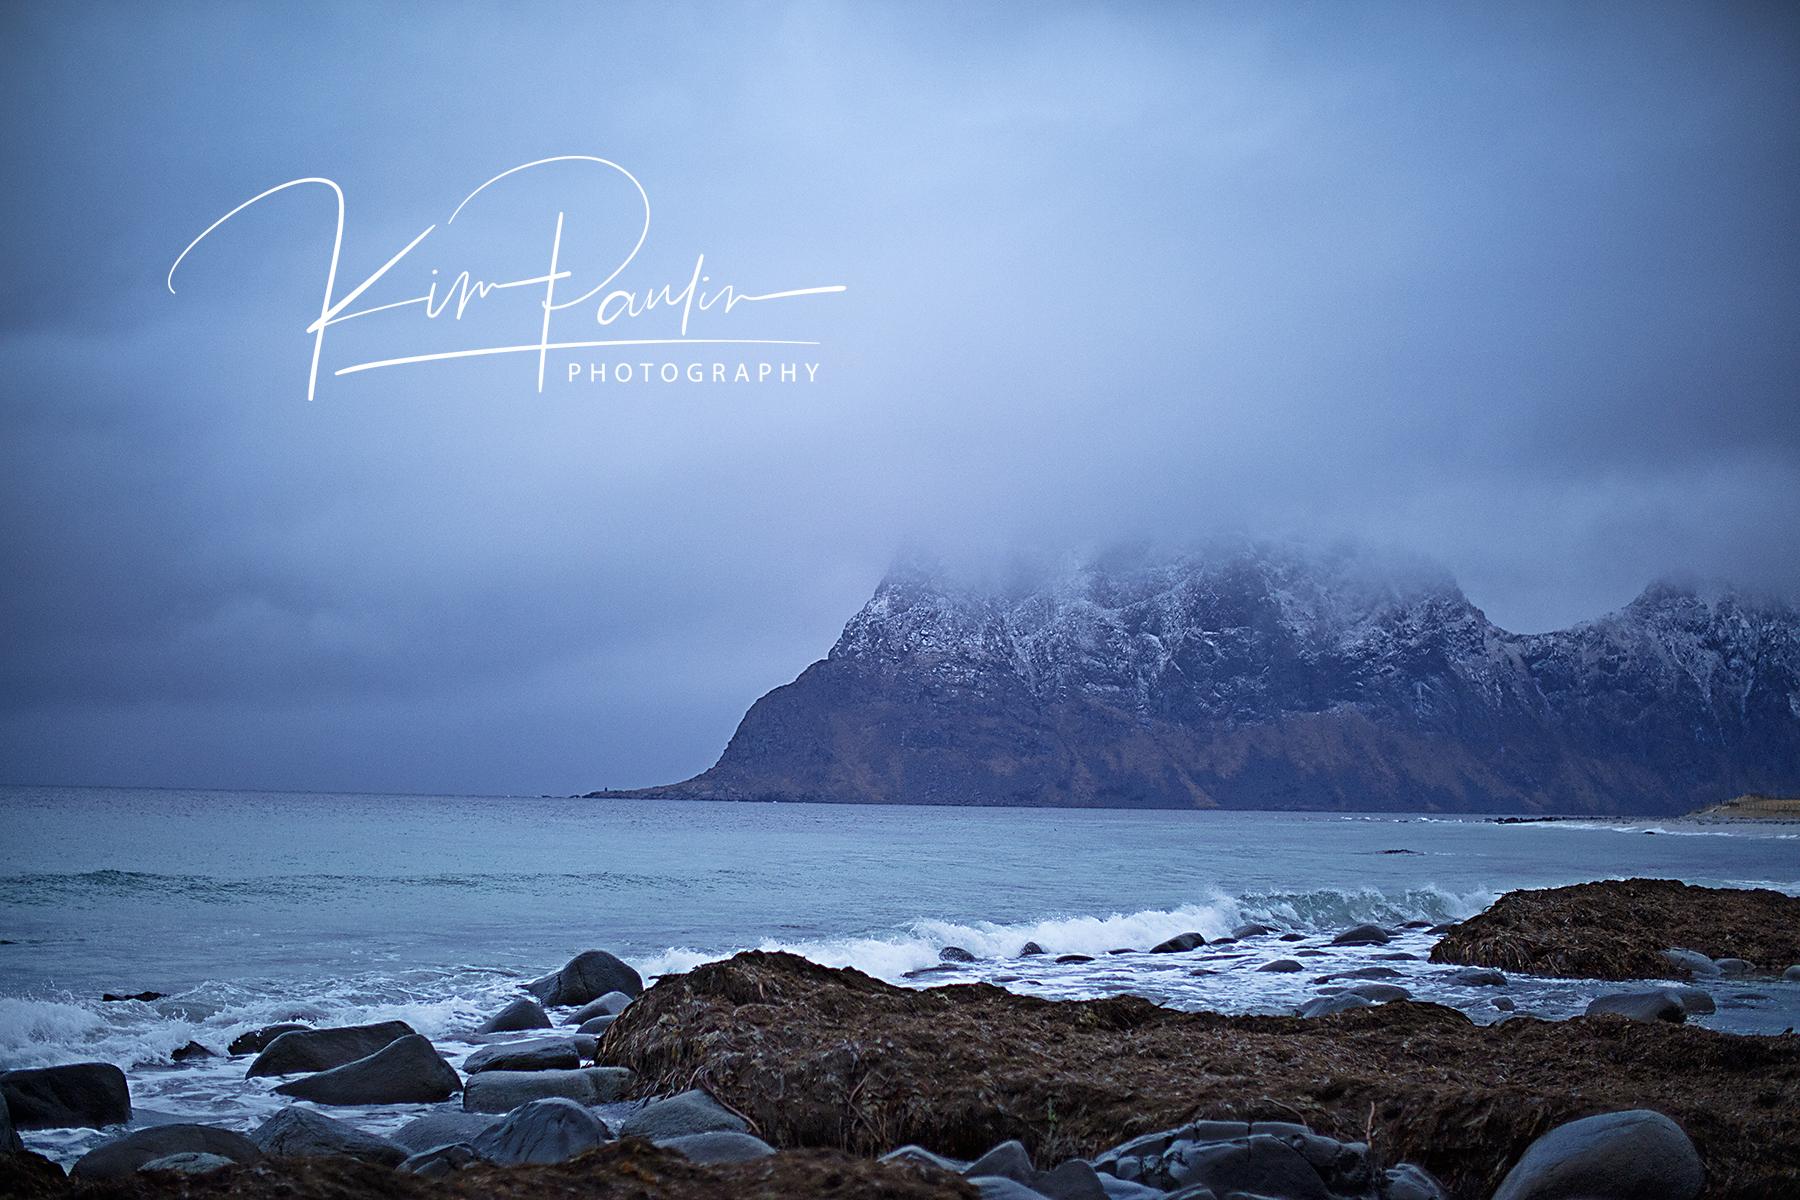 Norge, en naturfotografs våta dröm